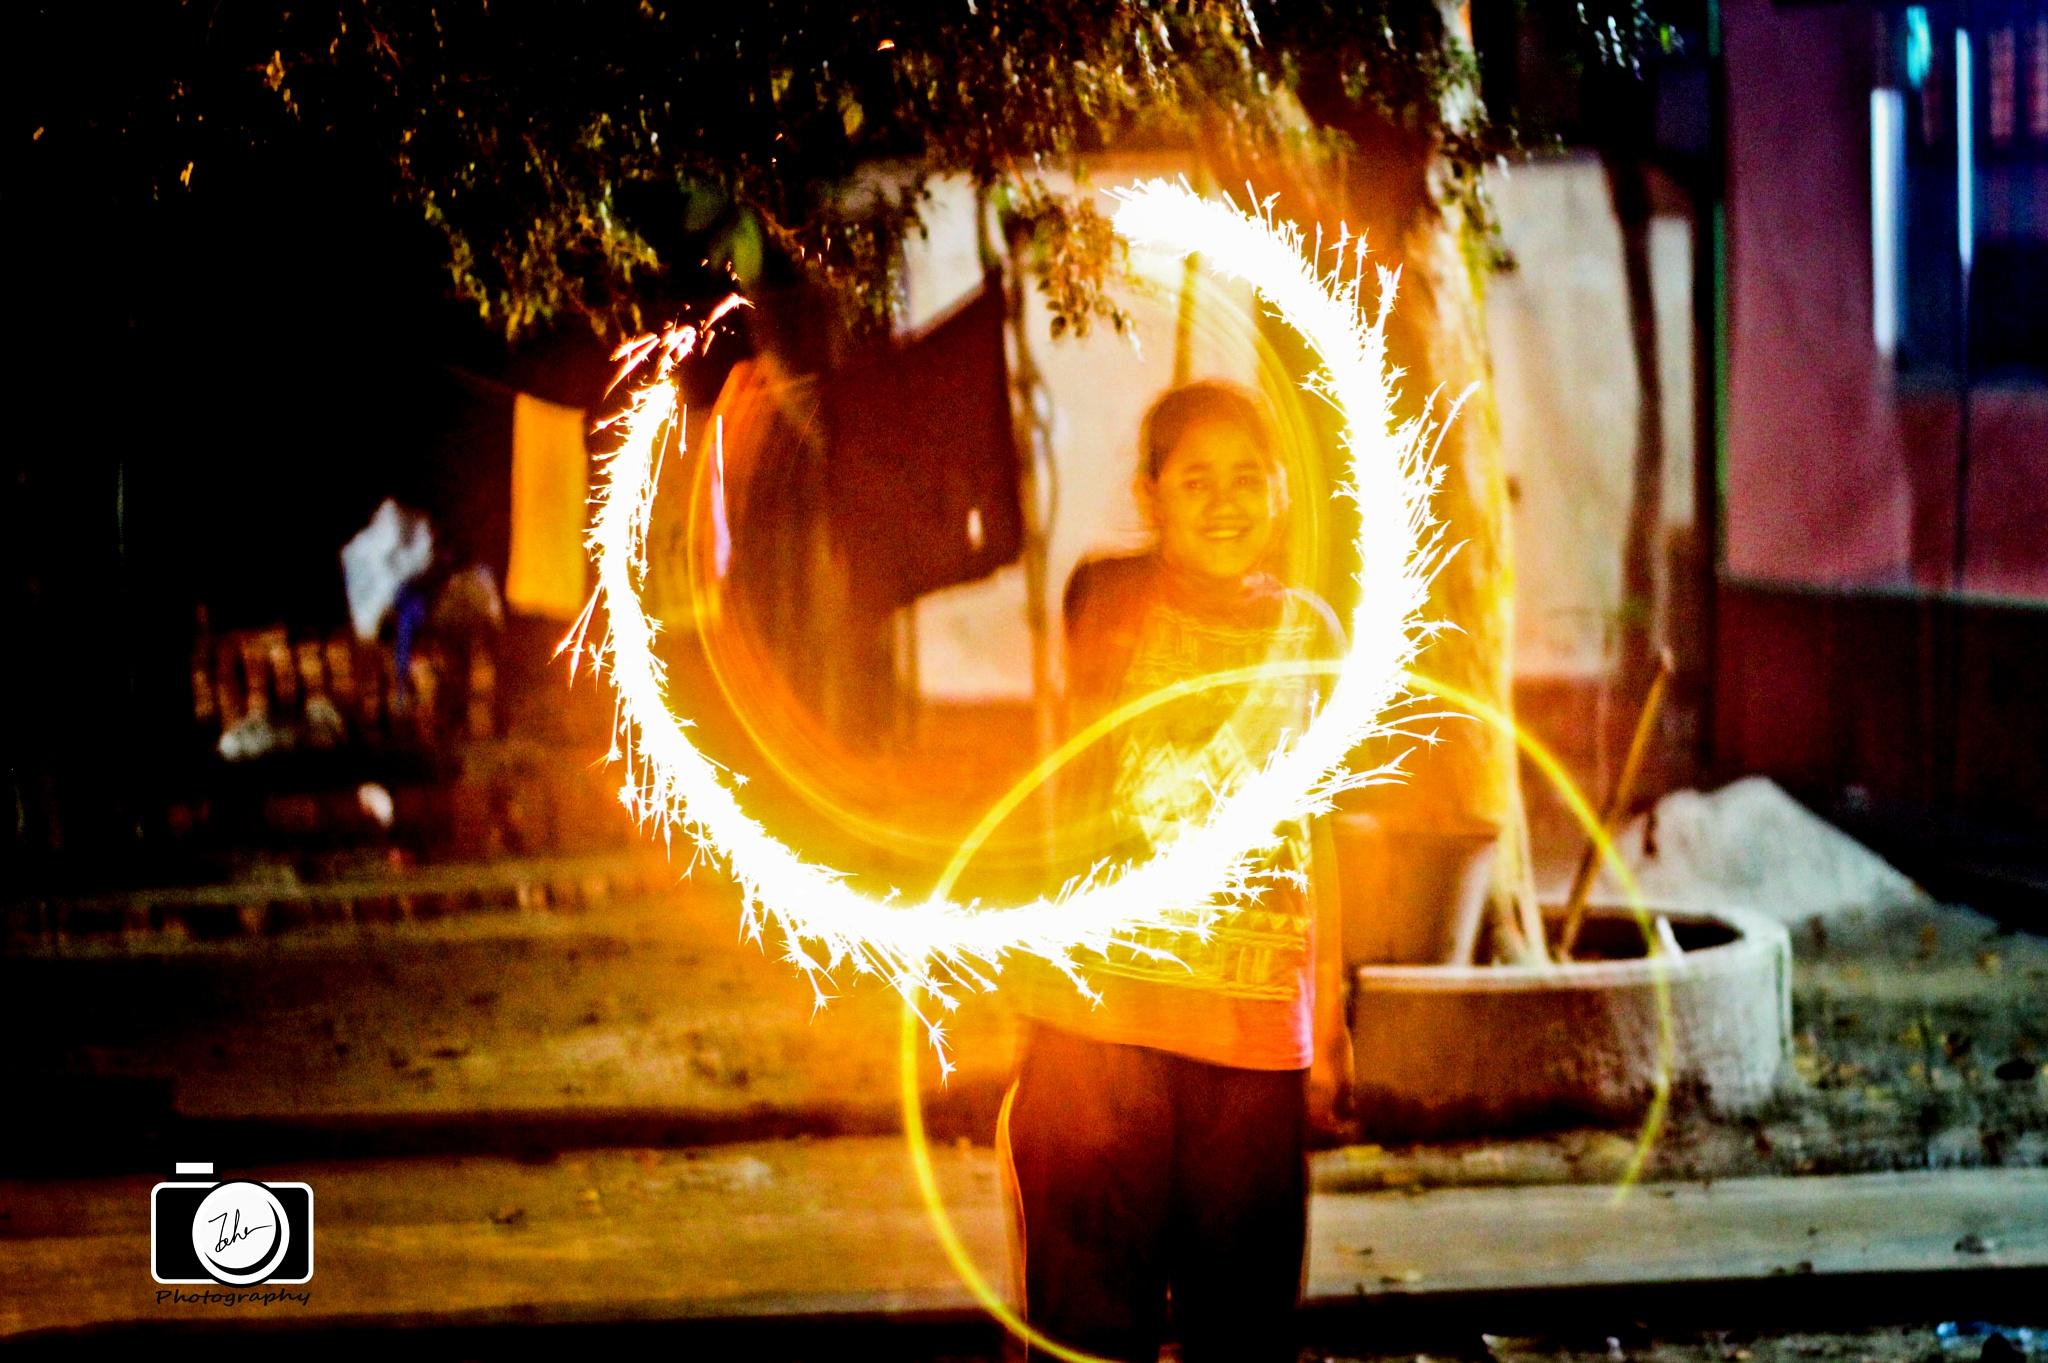 Fun with Fire works by Toha_Rahman